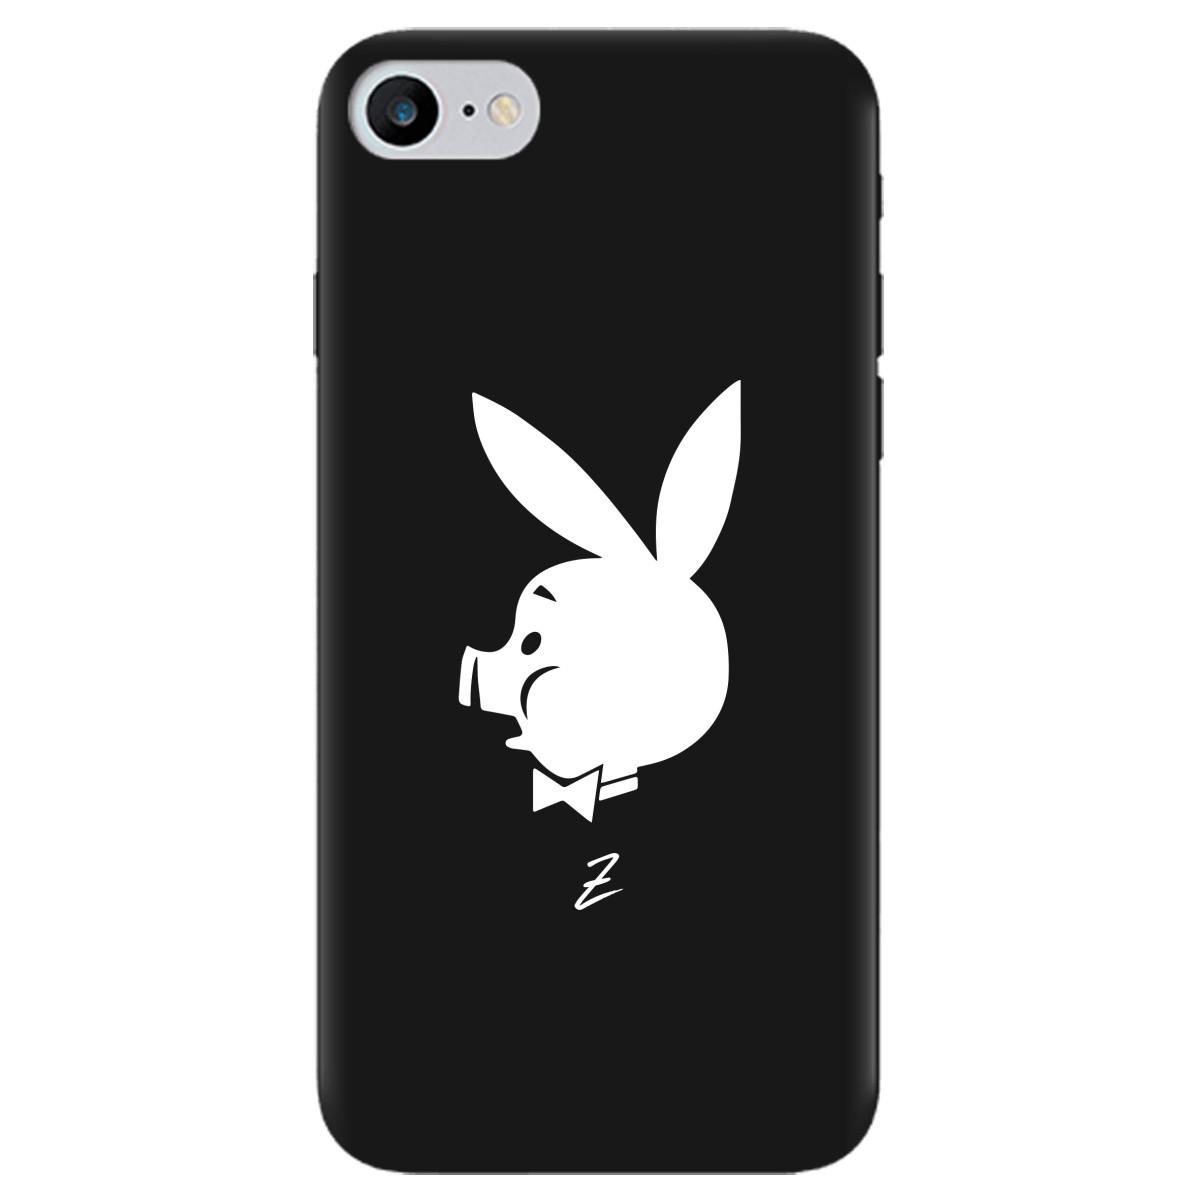 Чохол для Apple iPhone 7 чорний матовий soft touch Piggy